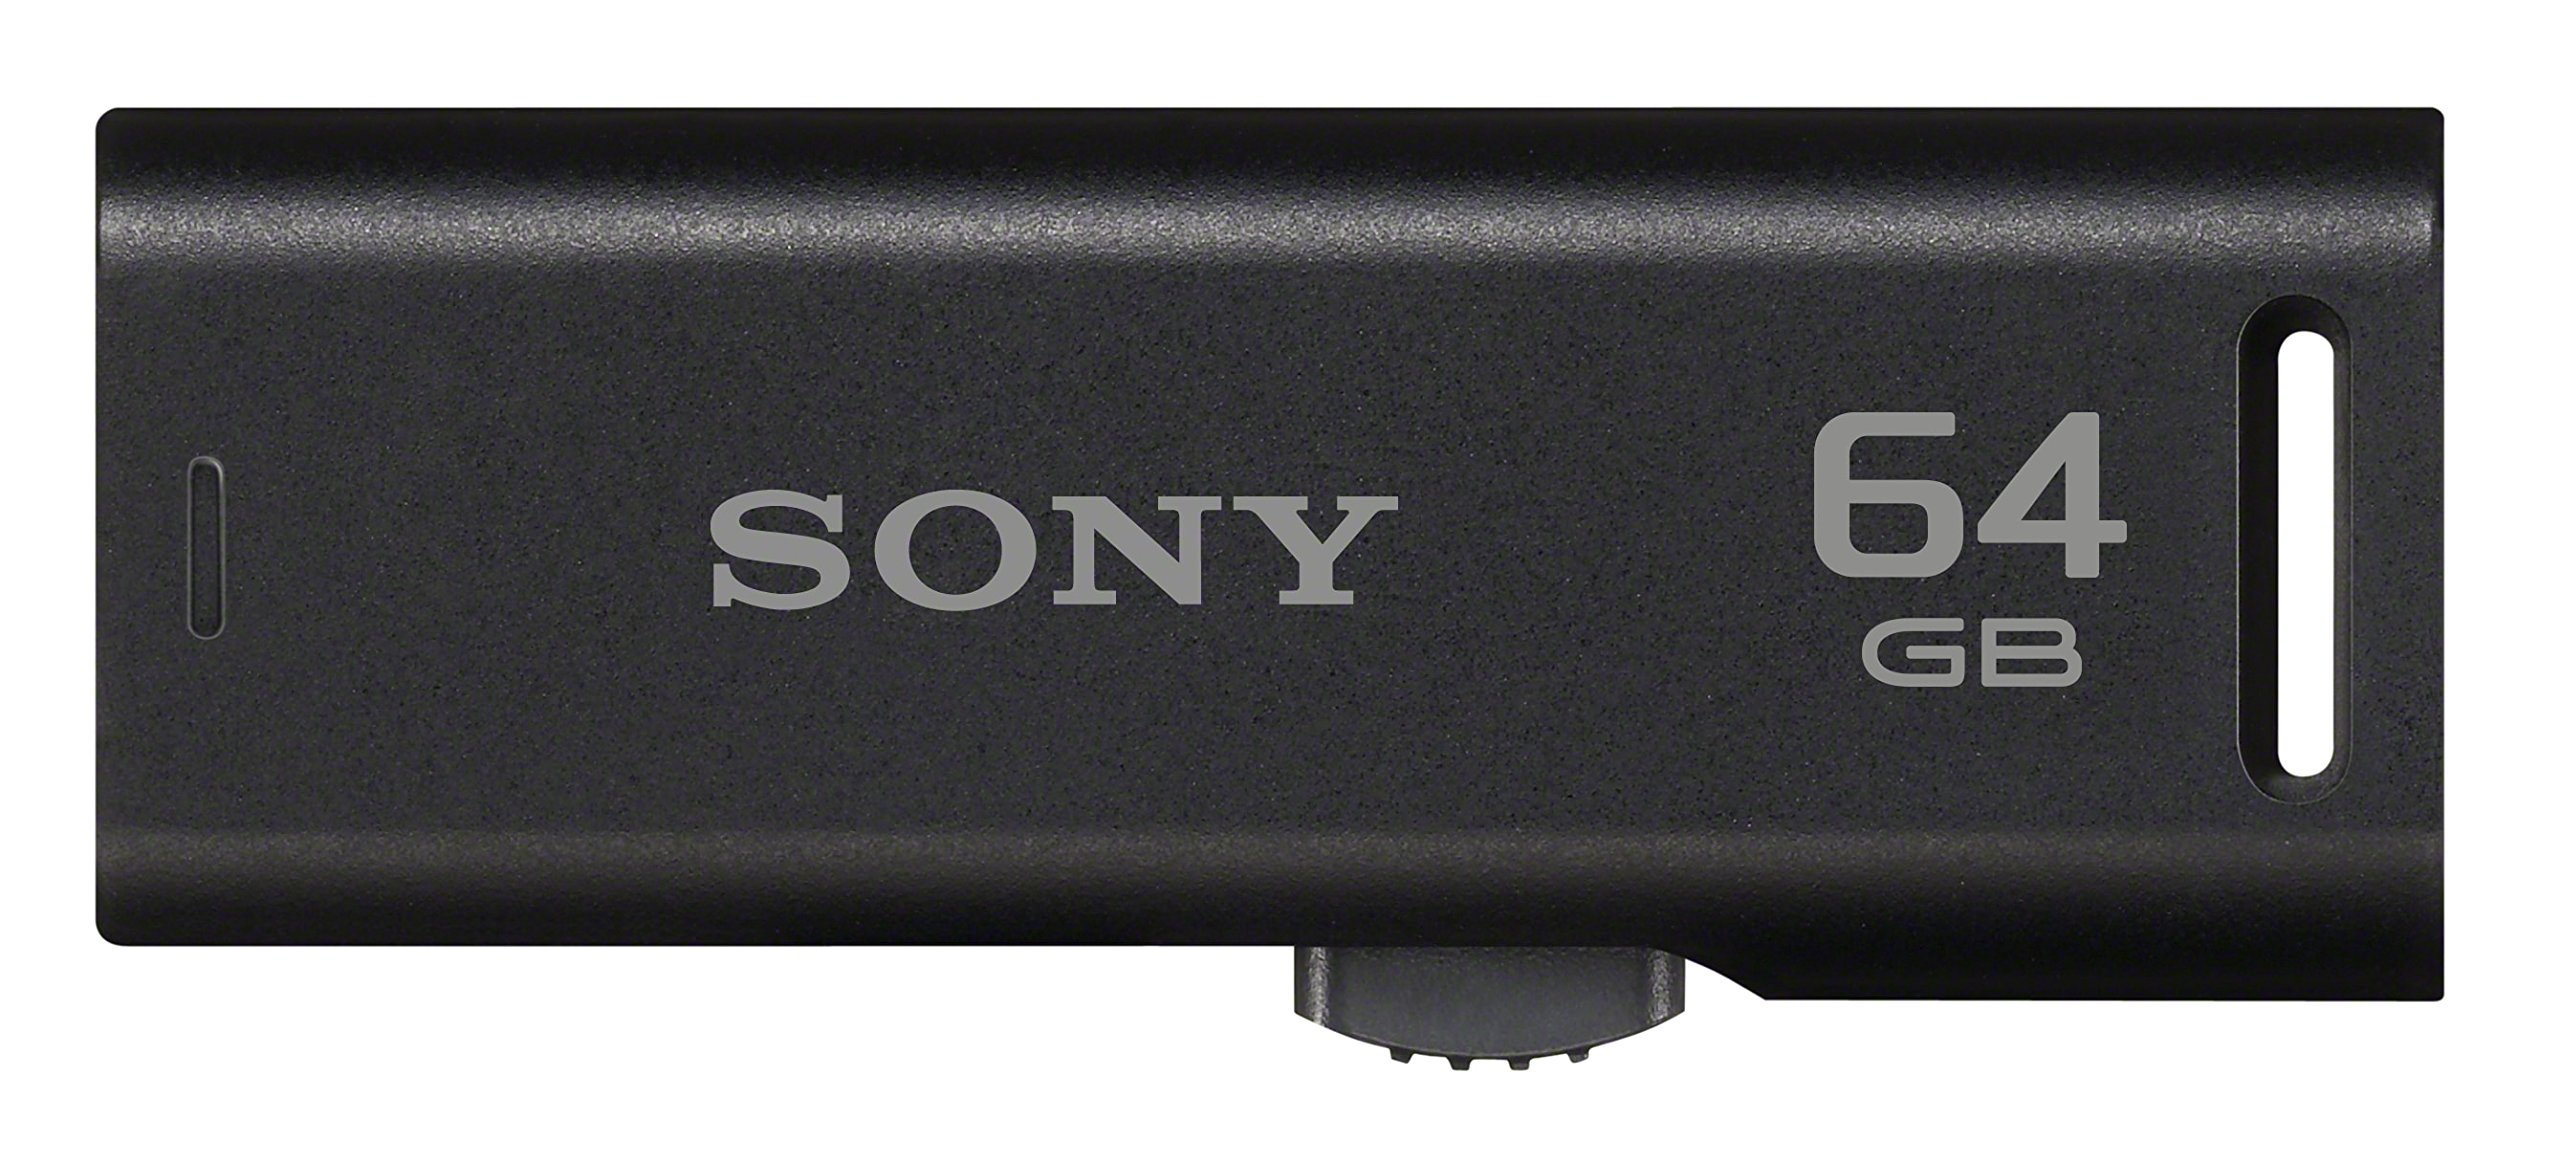 Sony USM64GR 64GB Classic Pen Drive (Black)